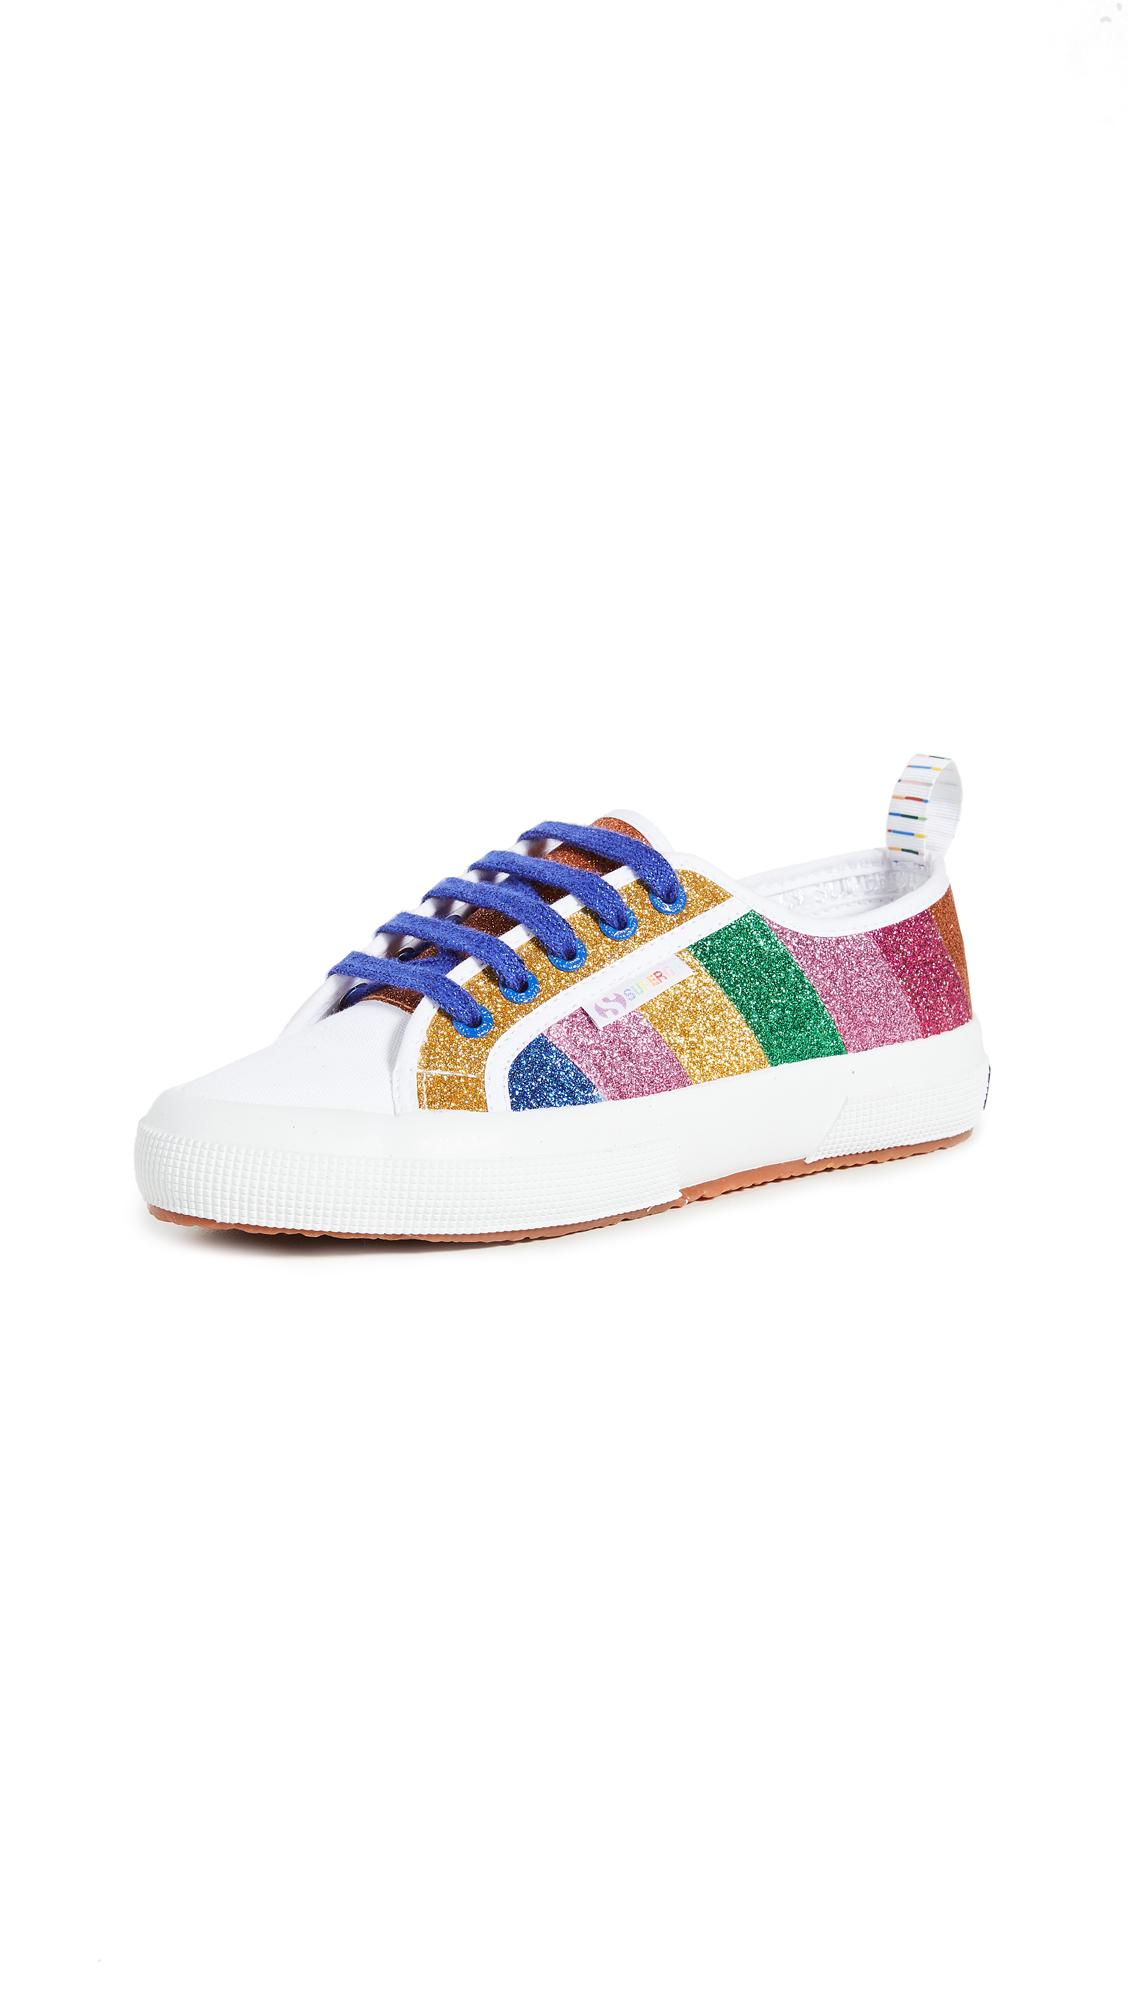 Buy Mira Mikati x Superga Glitter Stripe Sneakers online, shop Mira Mikati